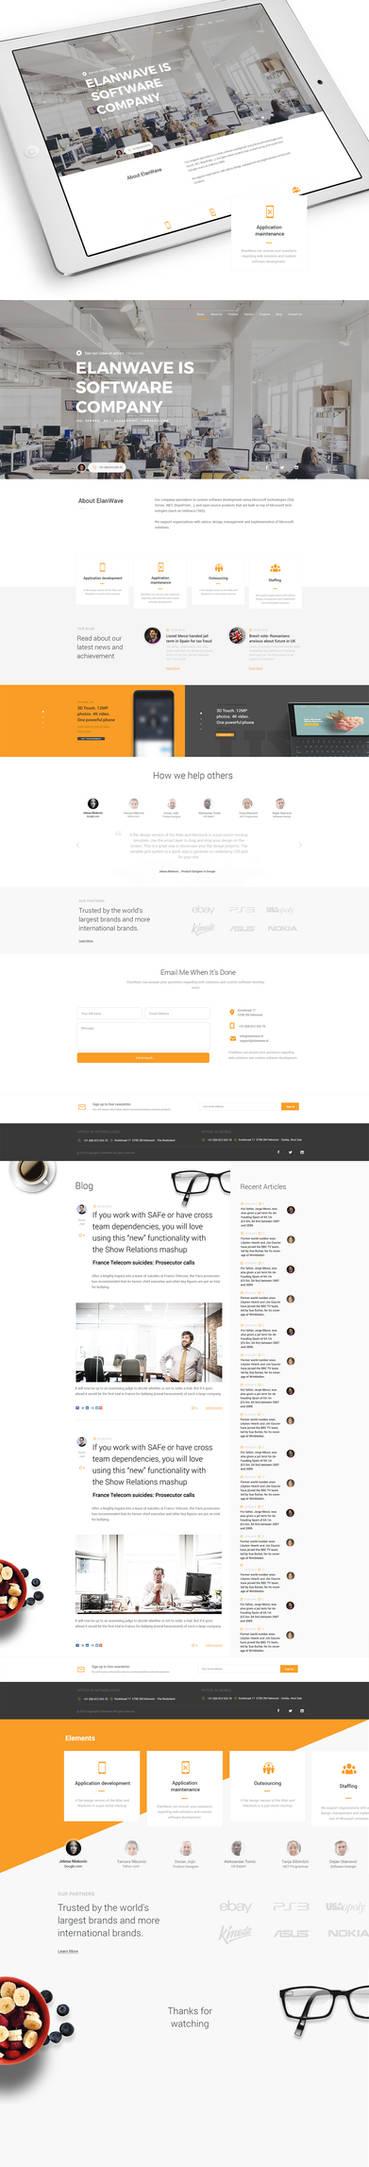 ElanWave.nl Web Design